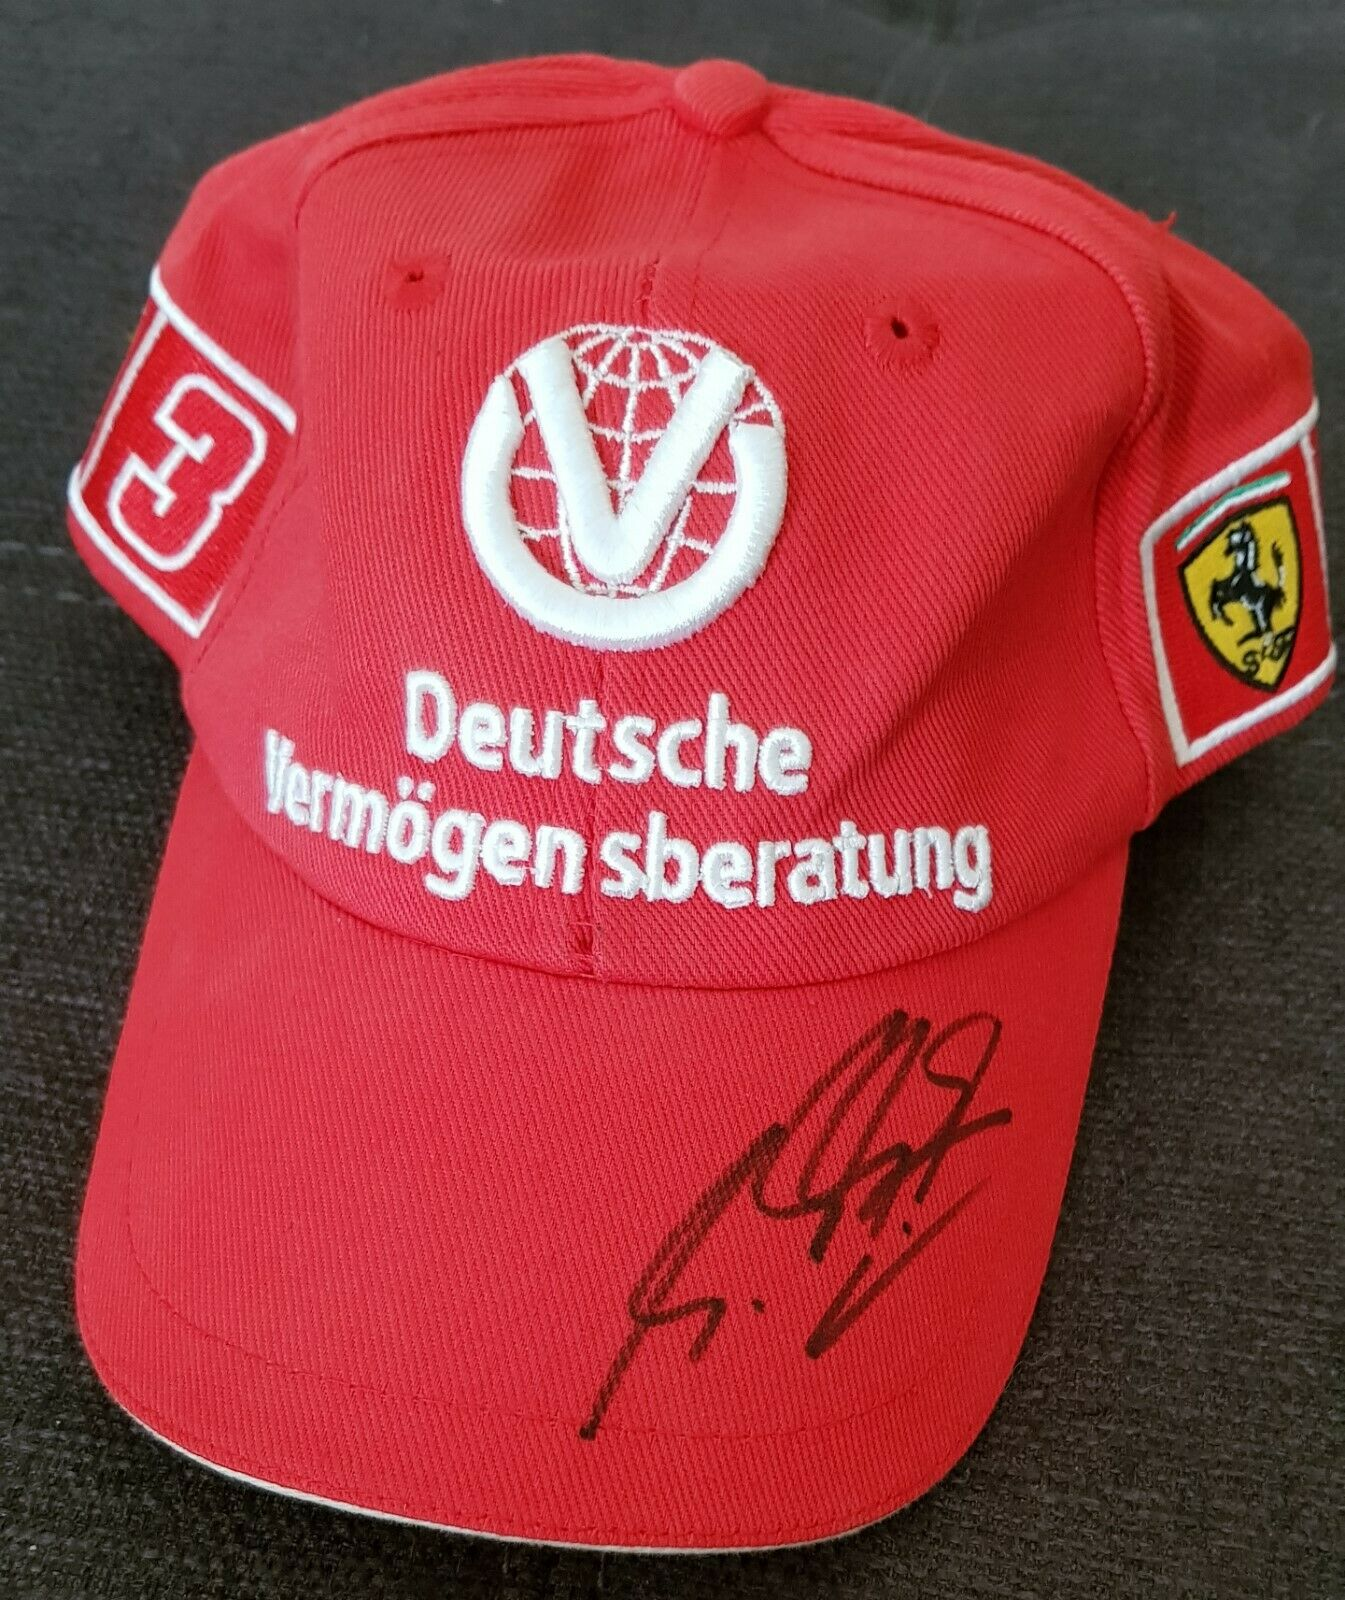 Schumacher Signed DVAG 2000 Cap